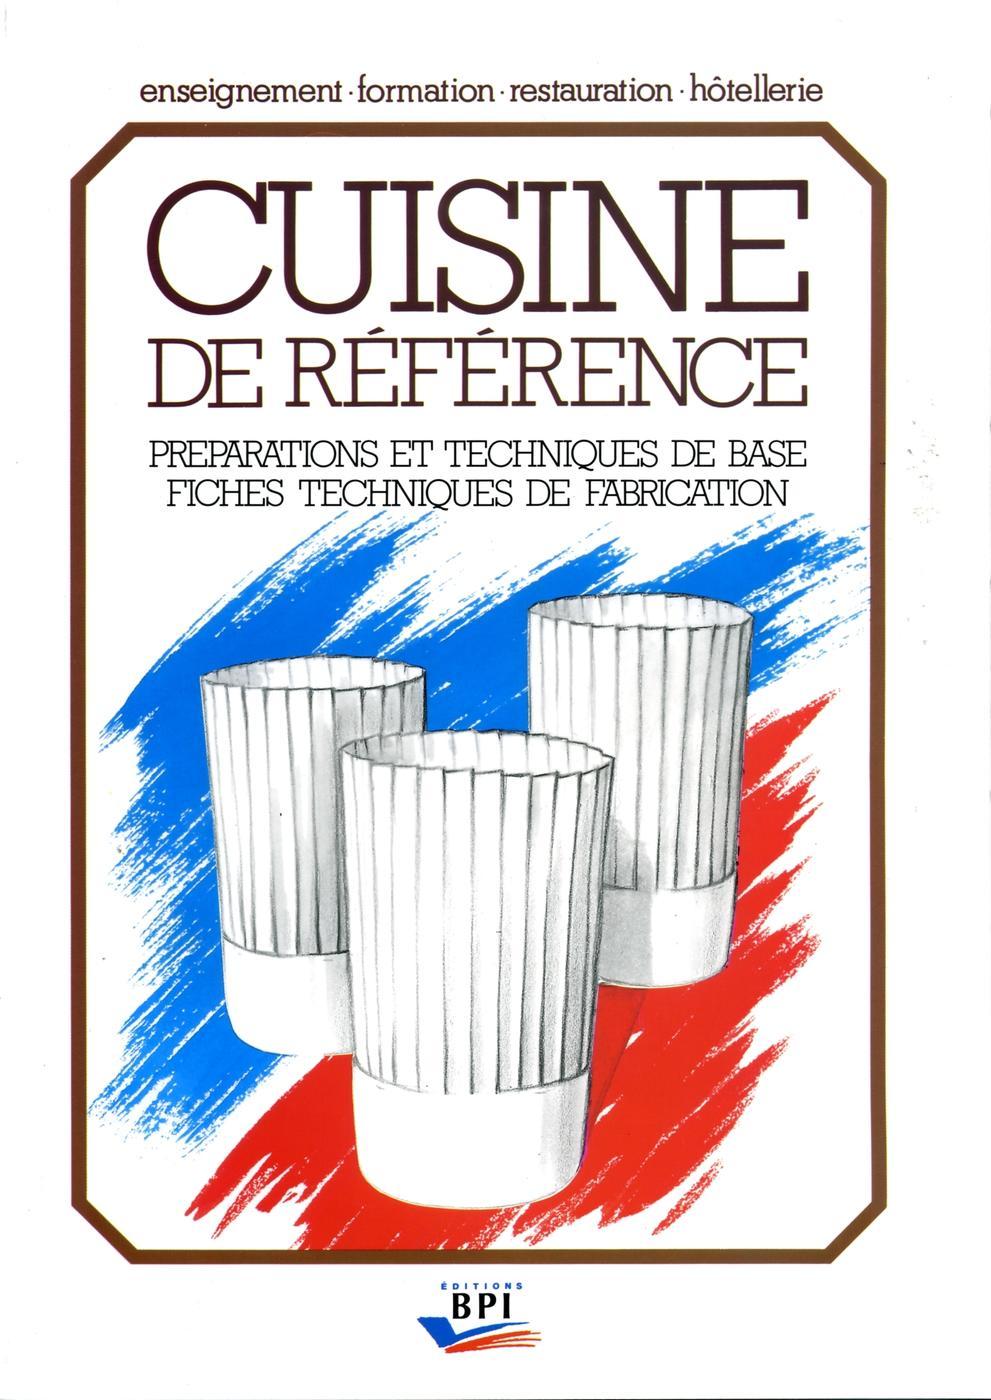 Cuisine De Reference Michel Maincent Morel Librairie Eyrolles